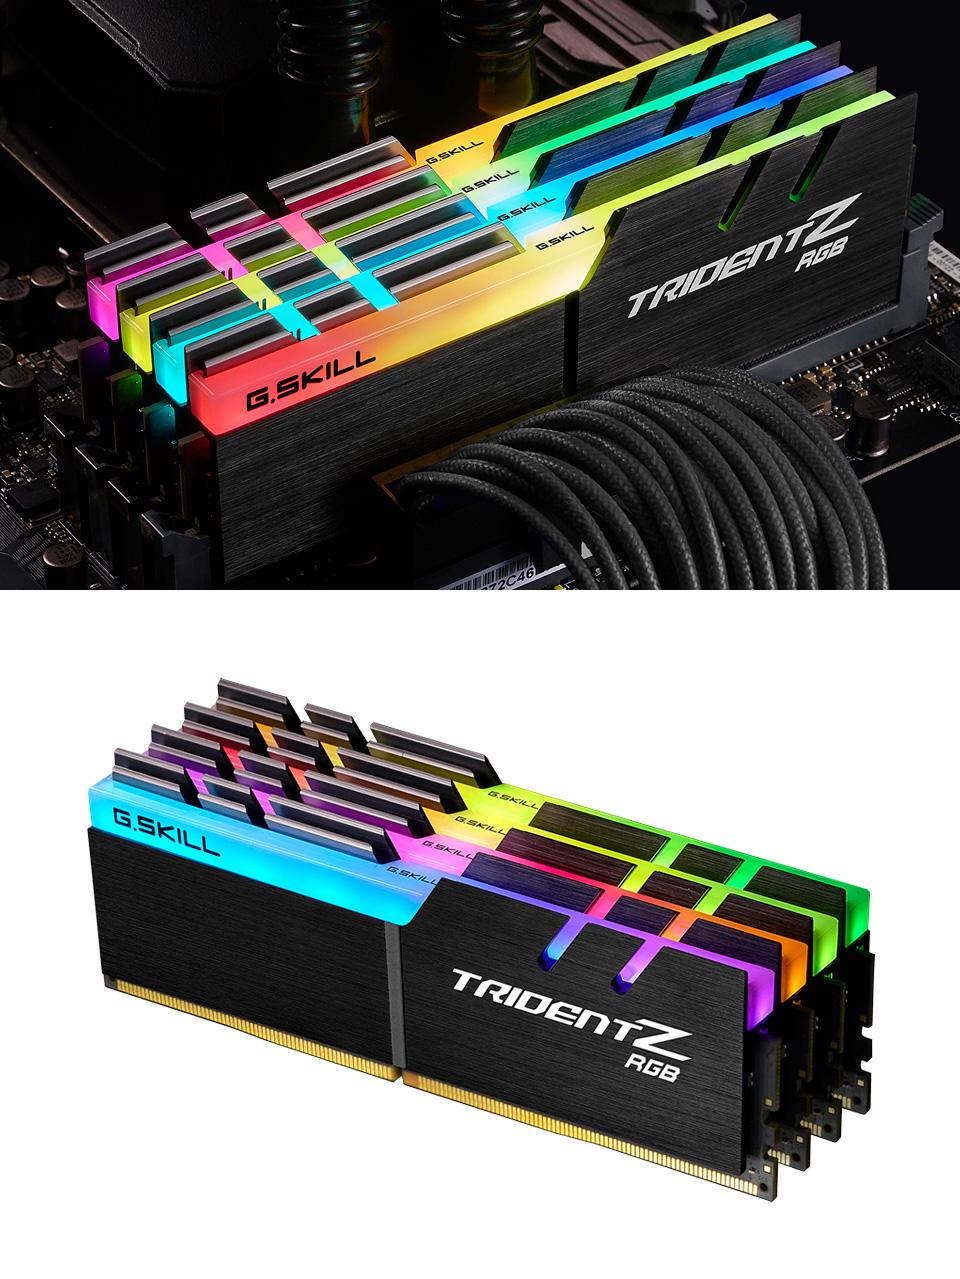 G.Skill Trident Z RGB F4-3600C18Q-64GTZR 64GB (4x16GB) DDR4 product